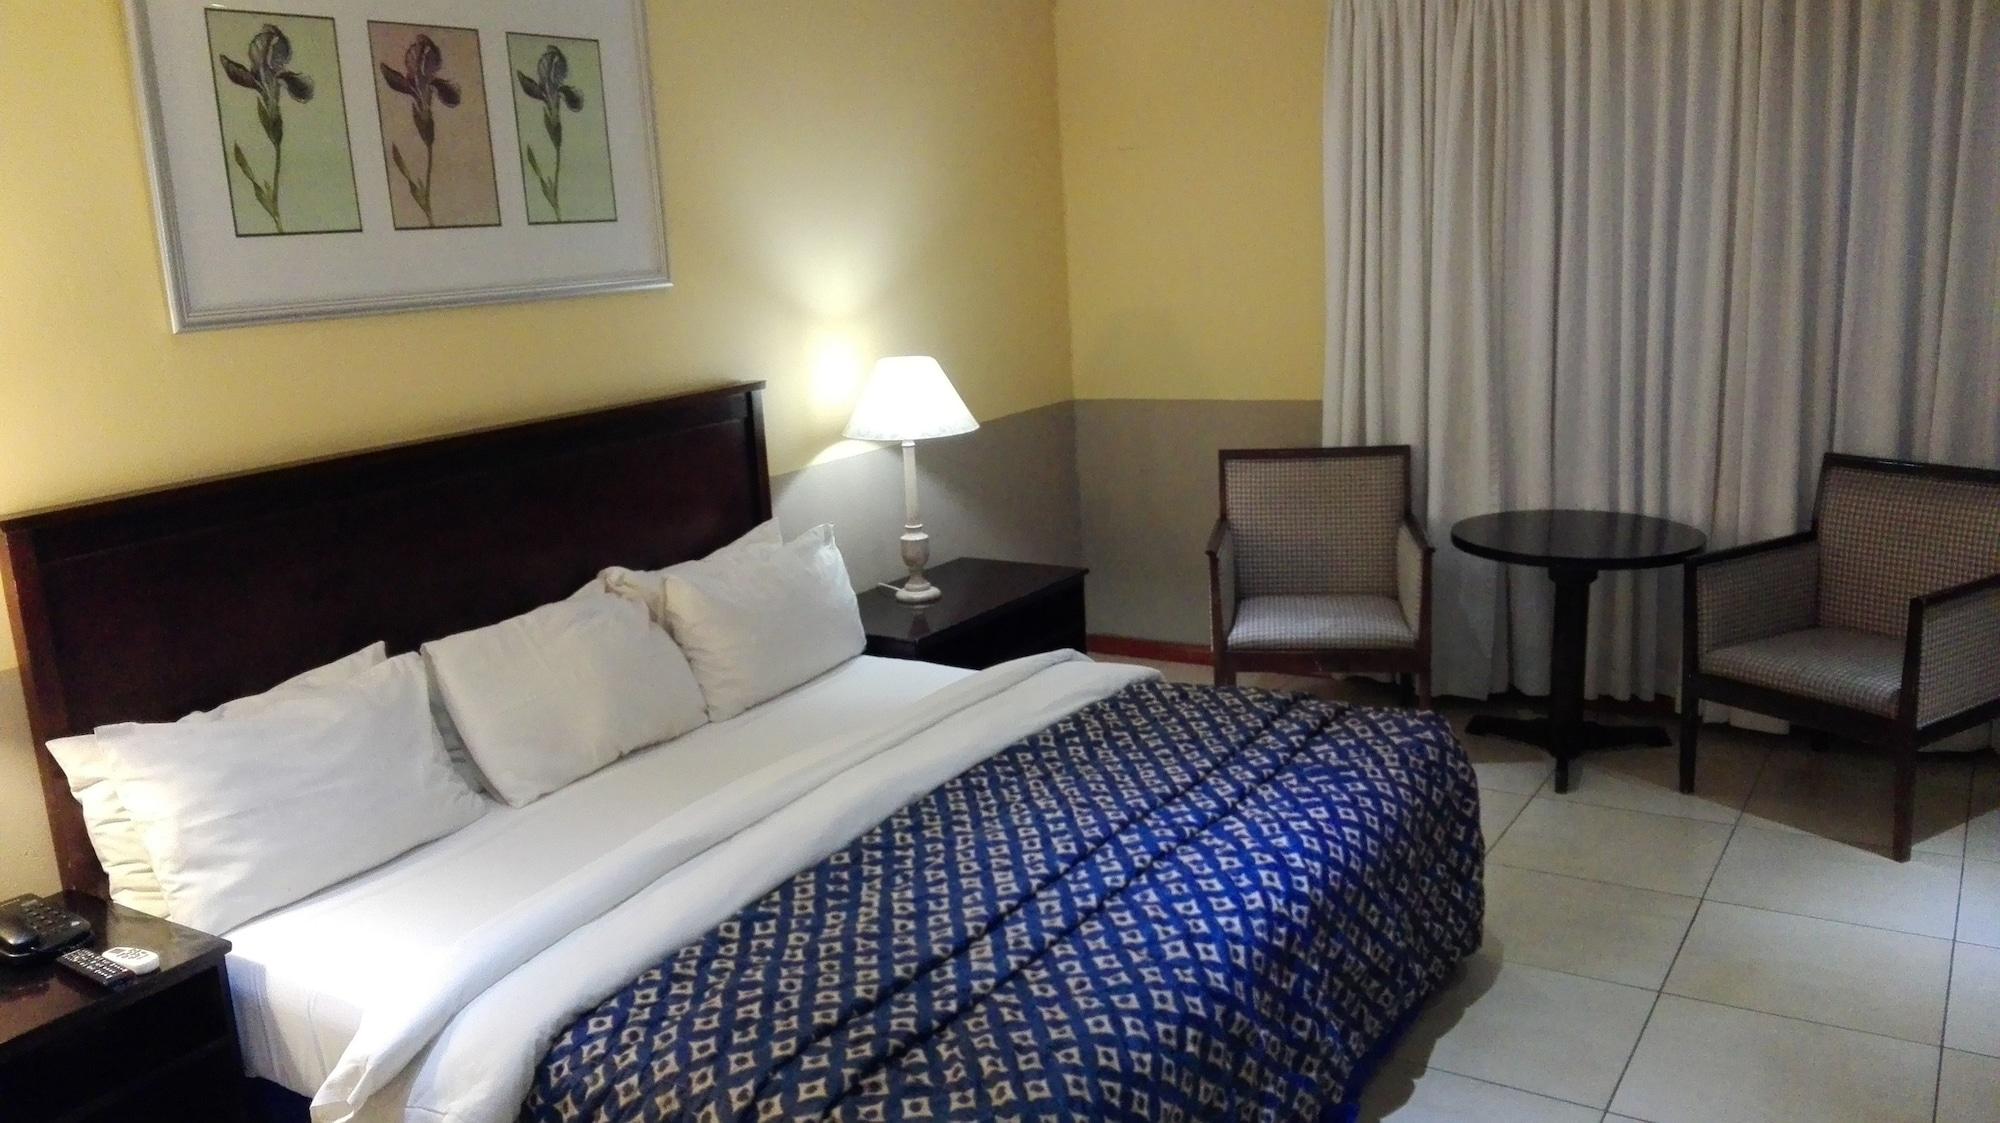 Villa Via - Midrand, City of Johannesburg